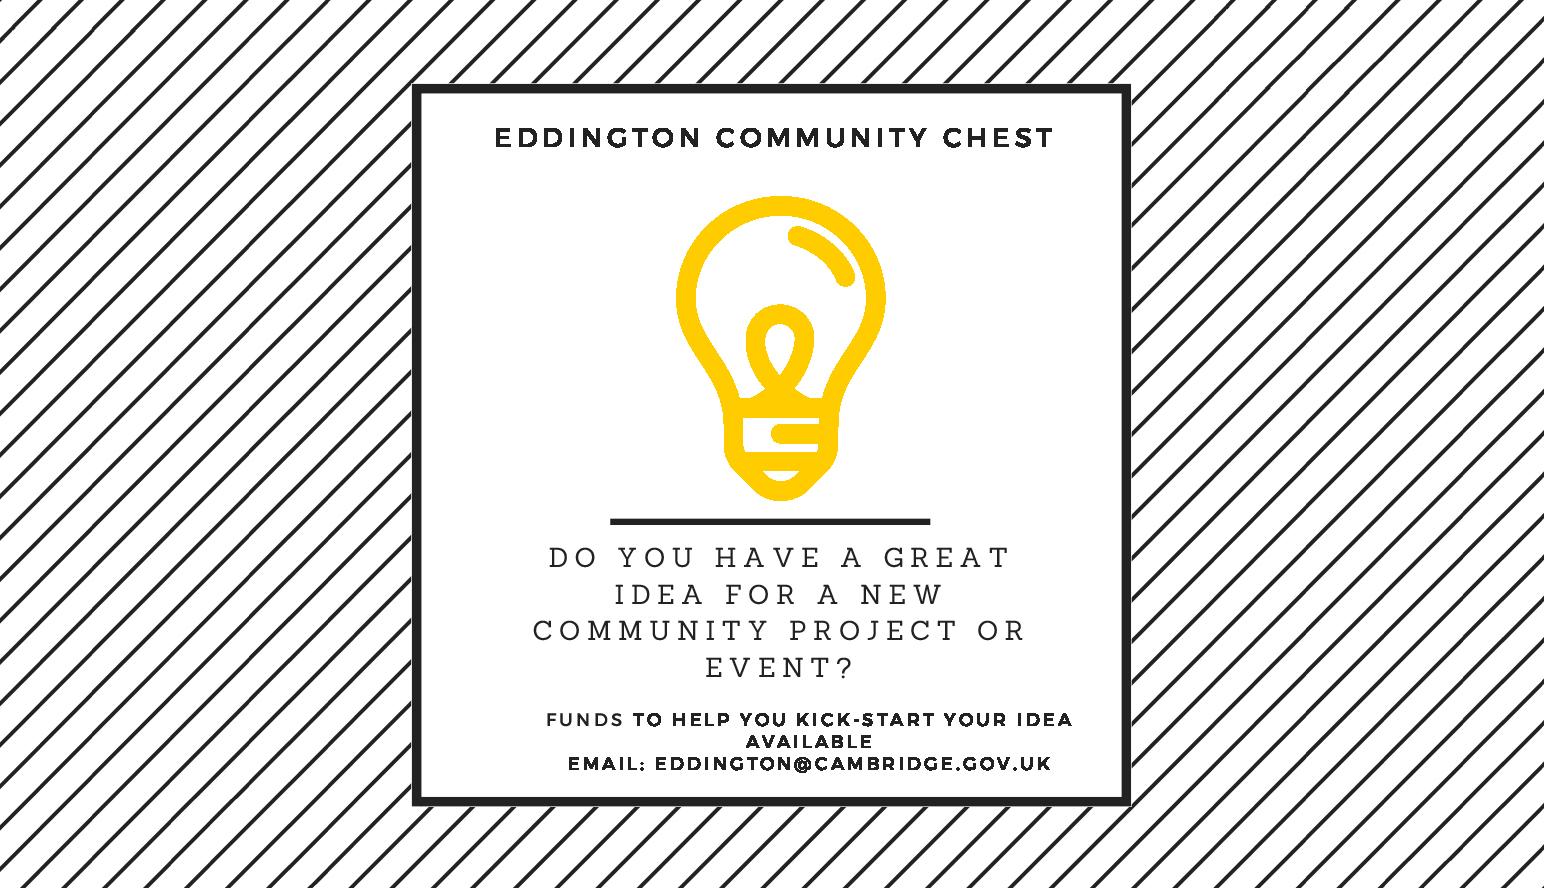 Eddington Community Chest